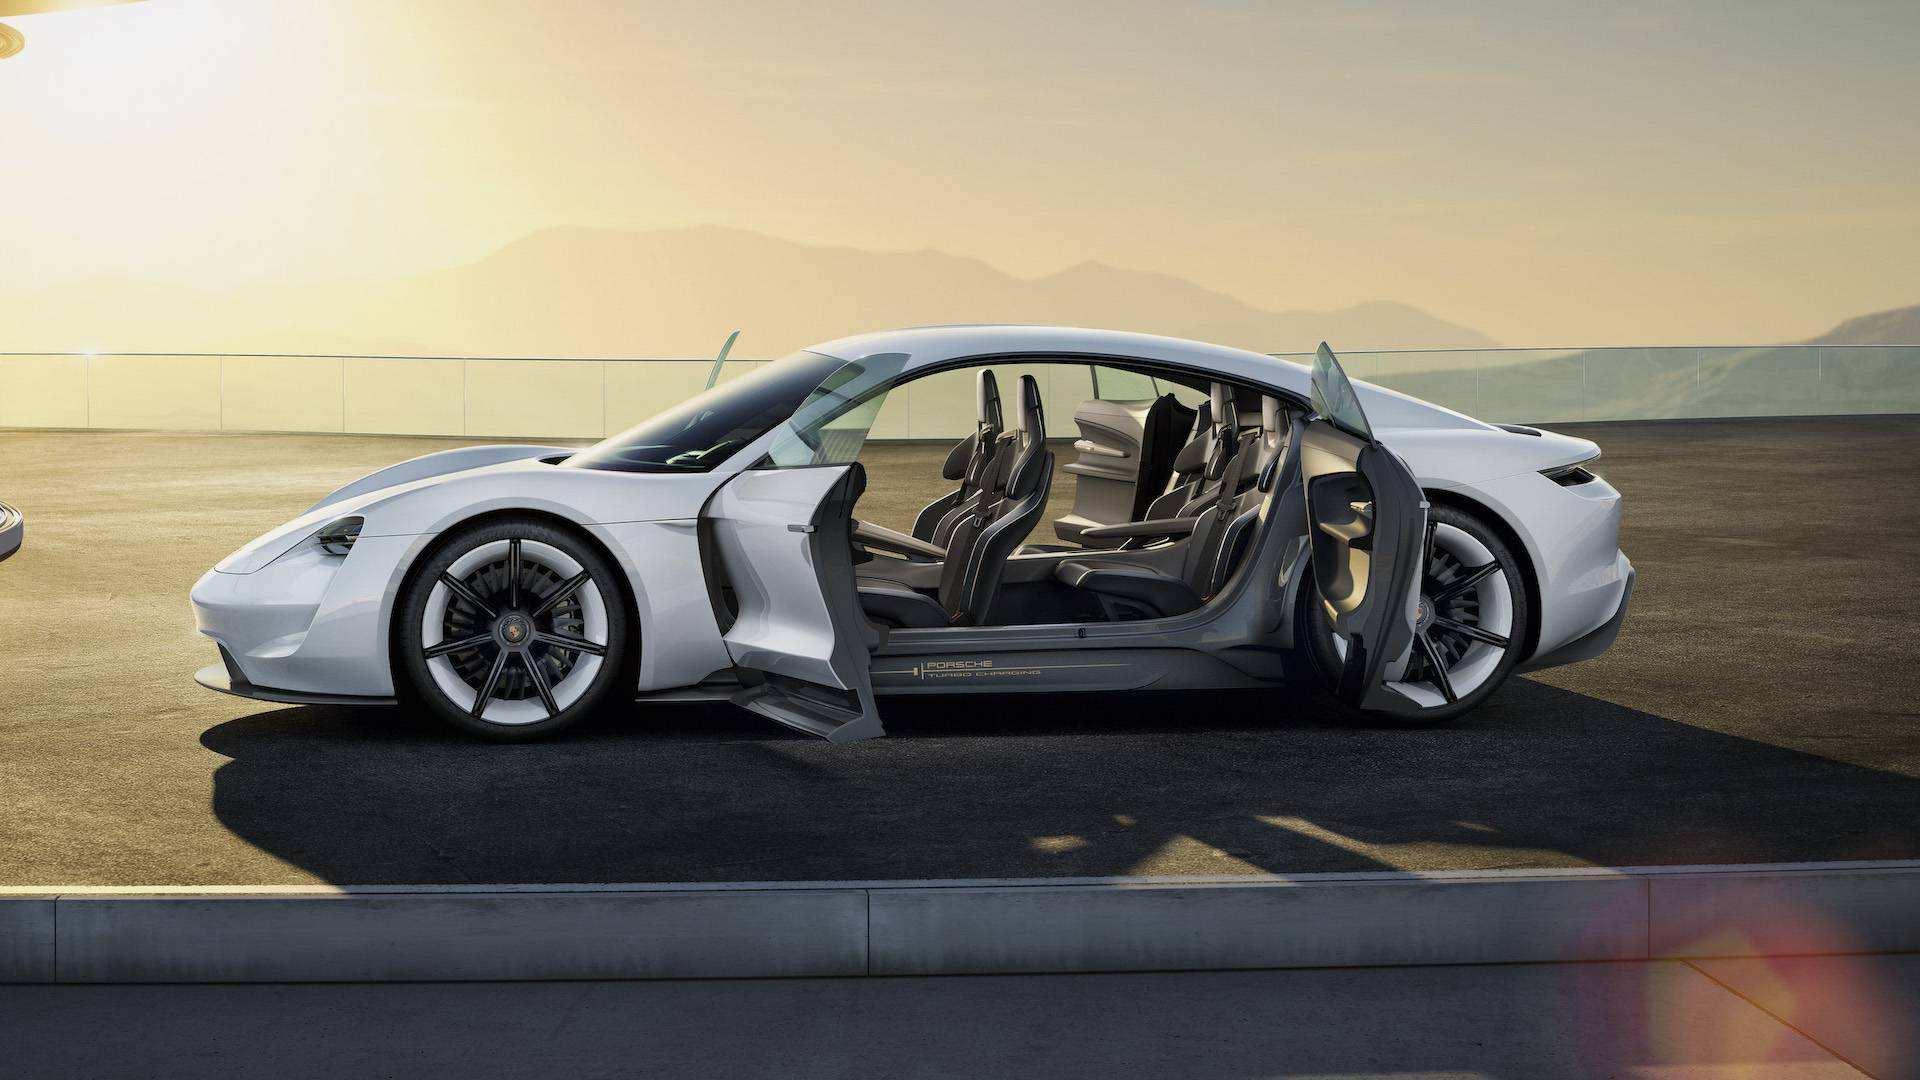 74 All New Porsche Modelle 2020 Performance by Porsche Modelle 2020